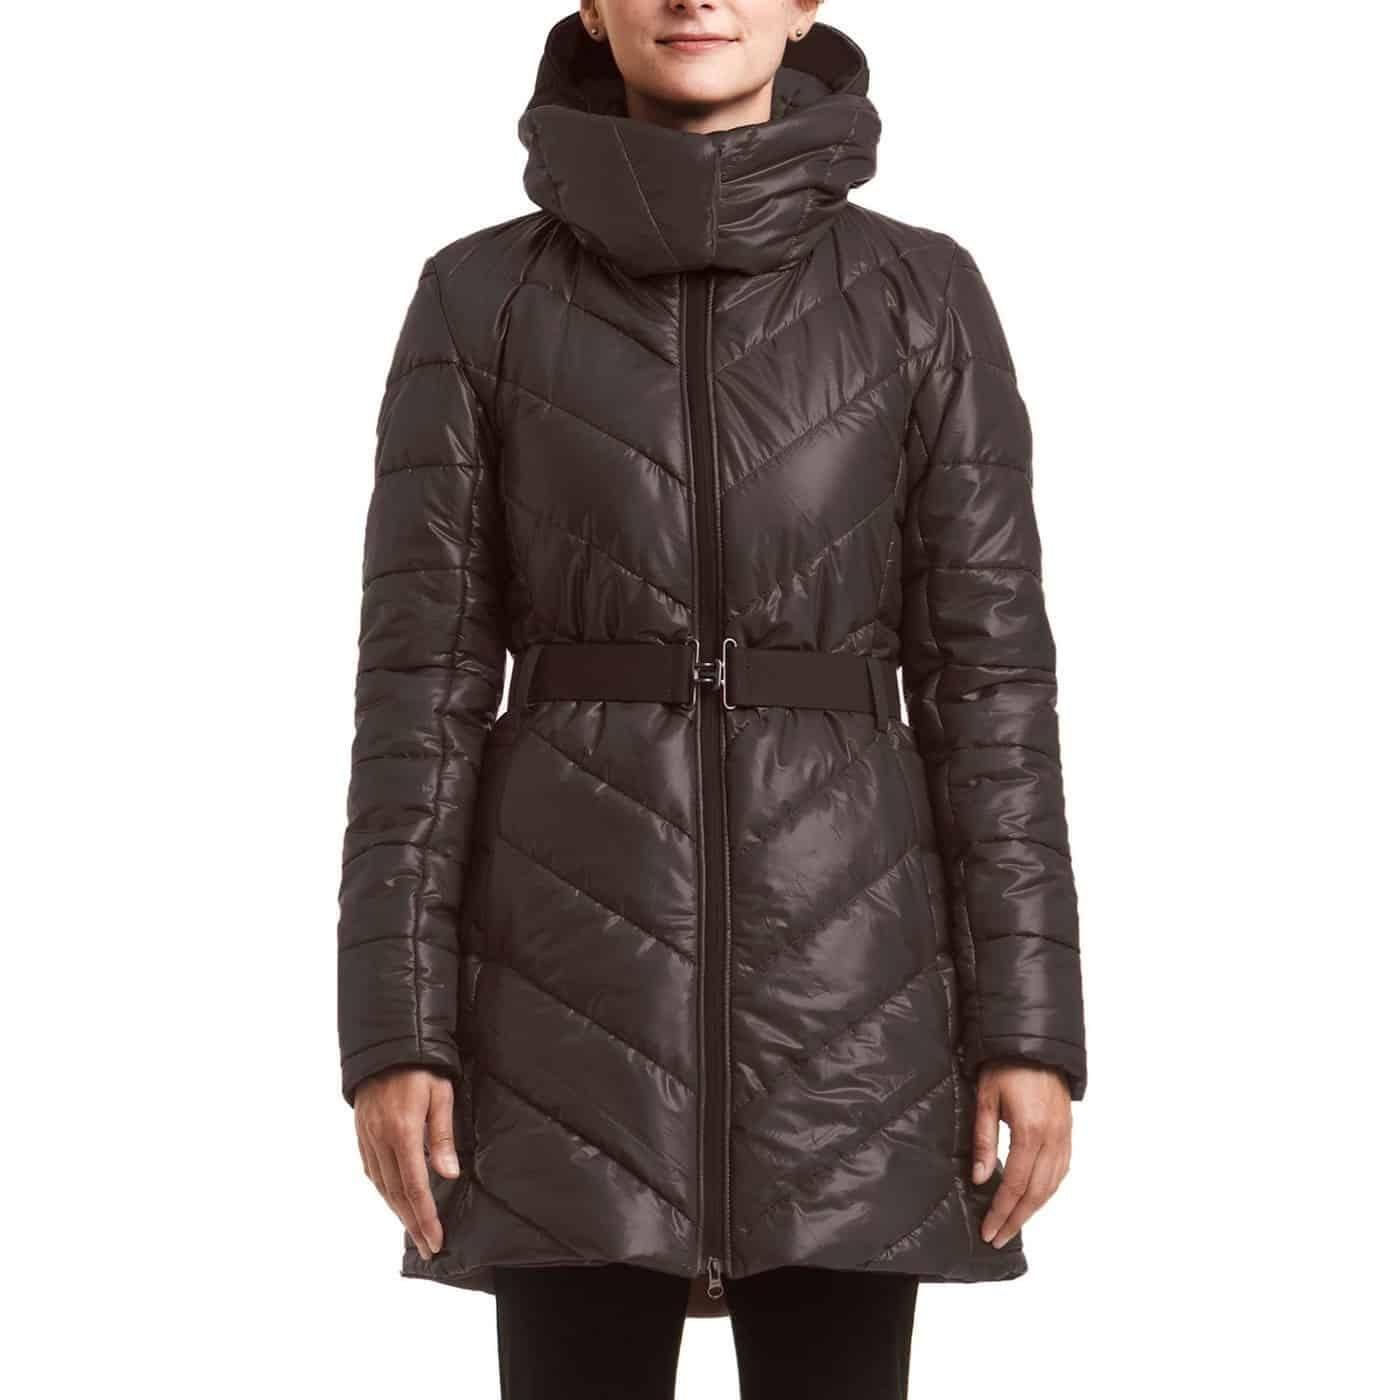 Canada Goose montebello parka replica shop - Le manteau d'hiver Alice par FIG Clothing